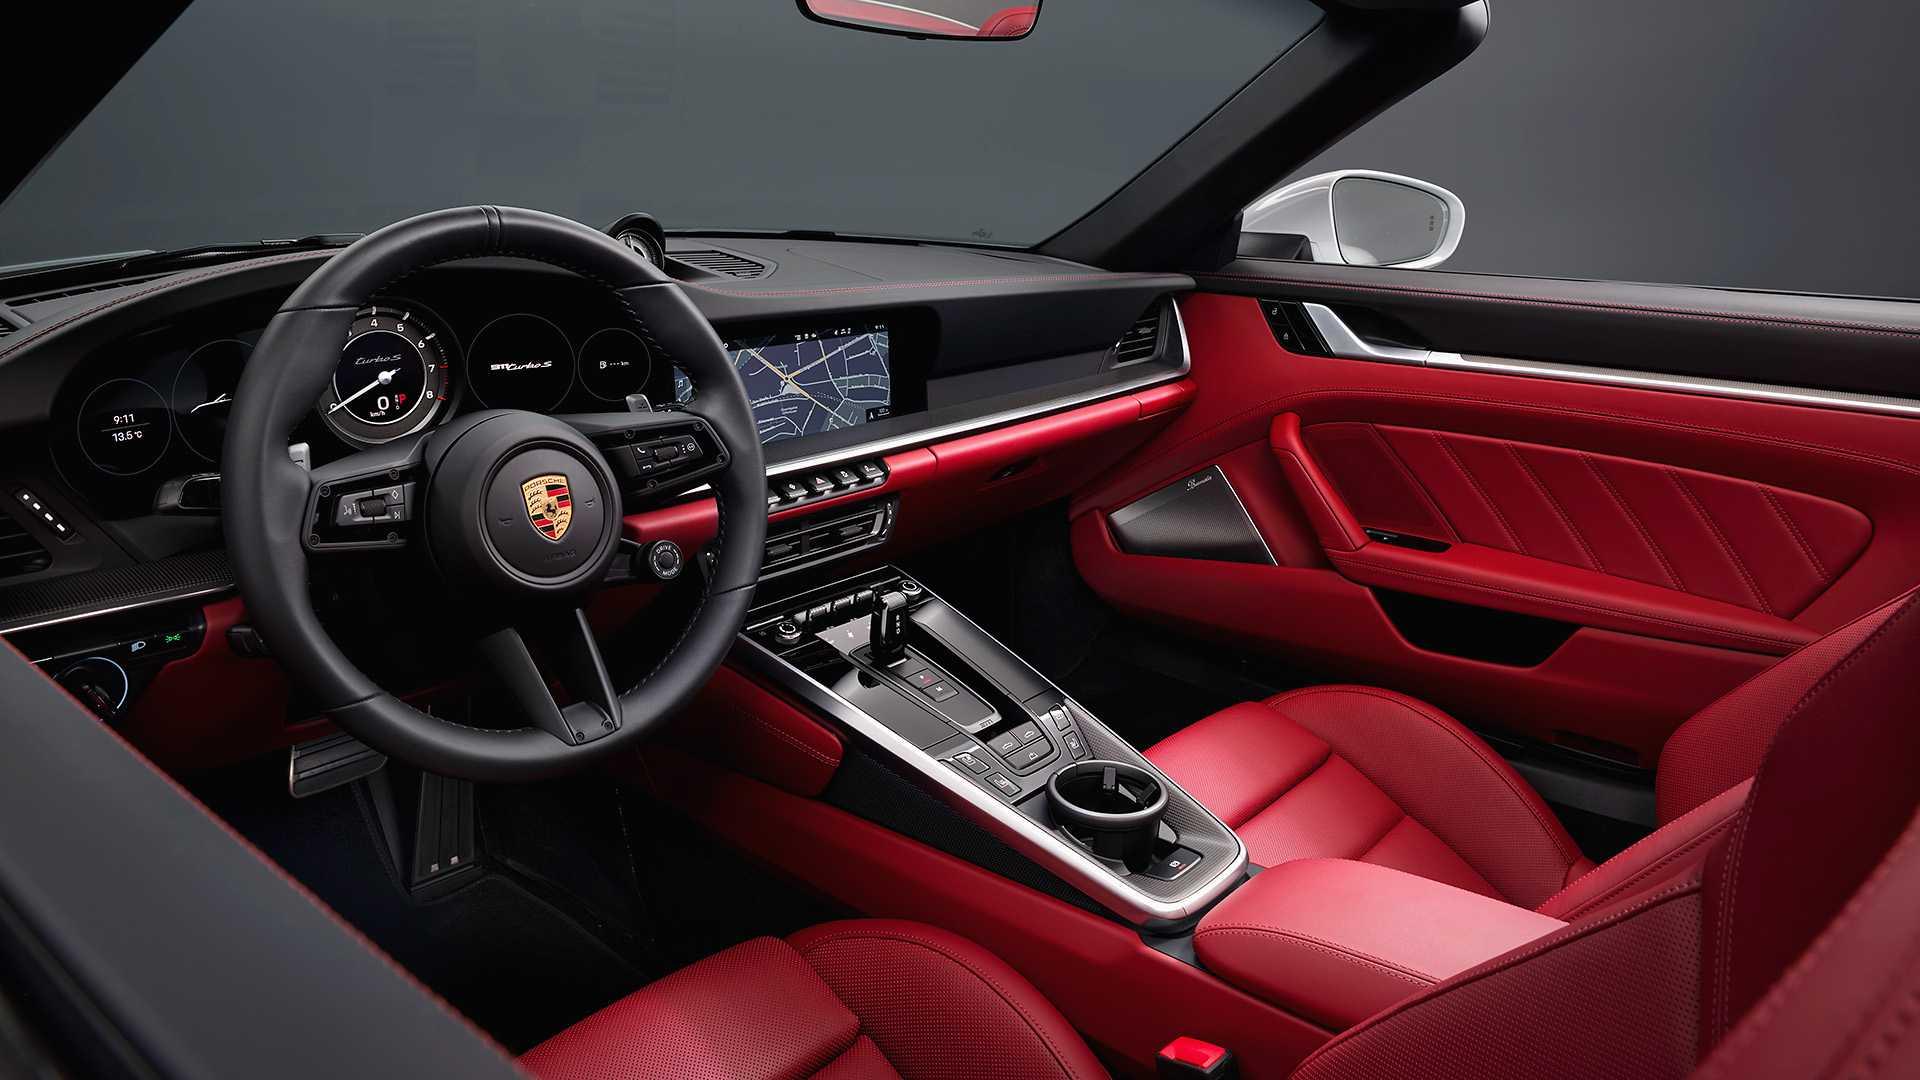 2021-Porsche-911-Turbo-S-2 | Arabs Auto